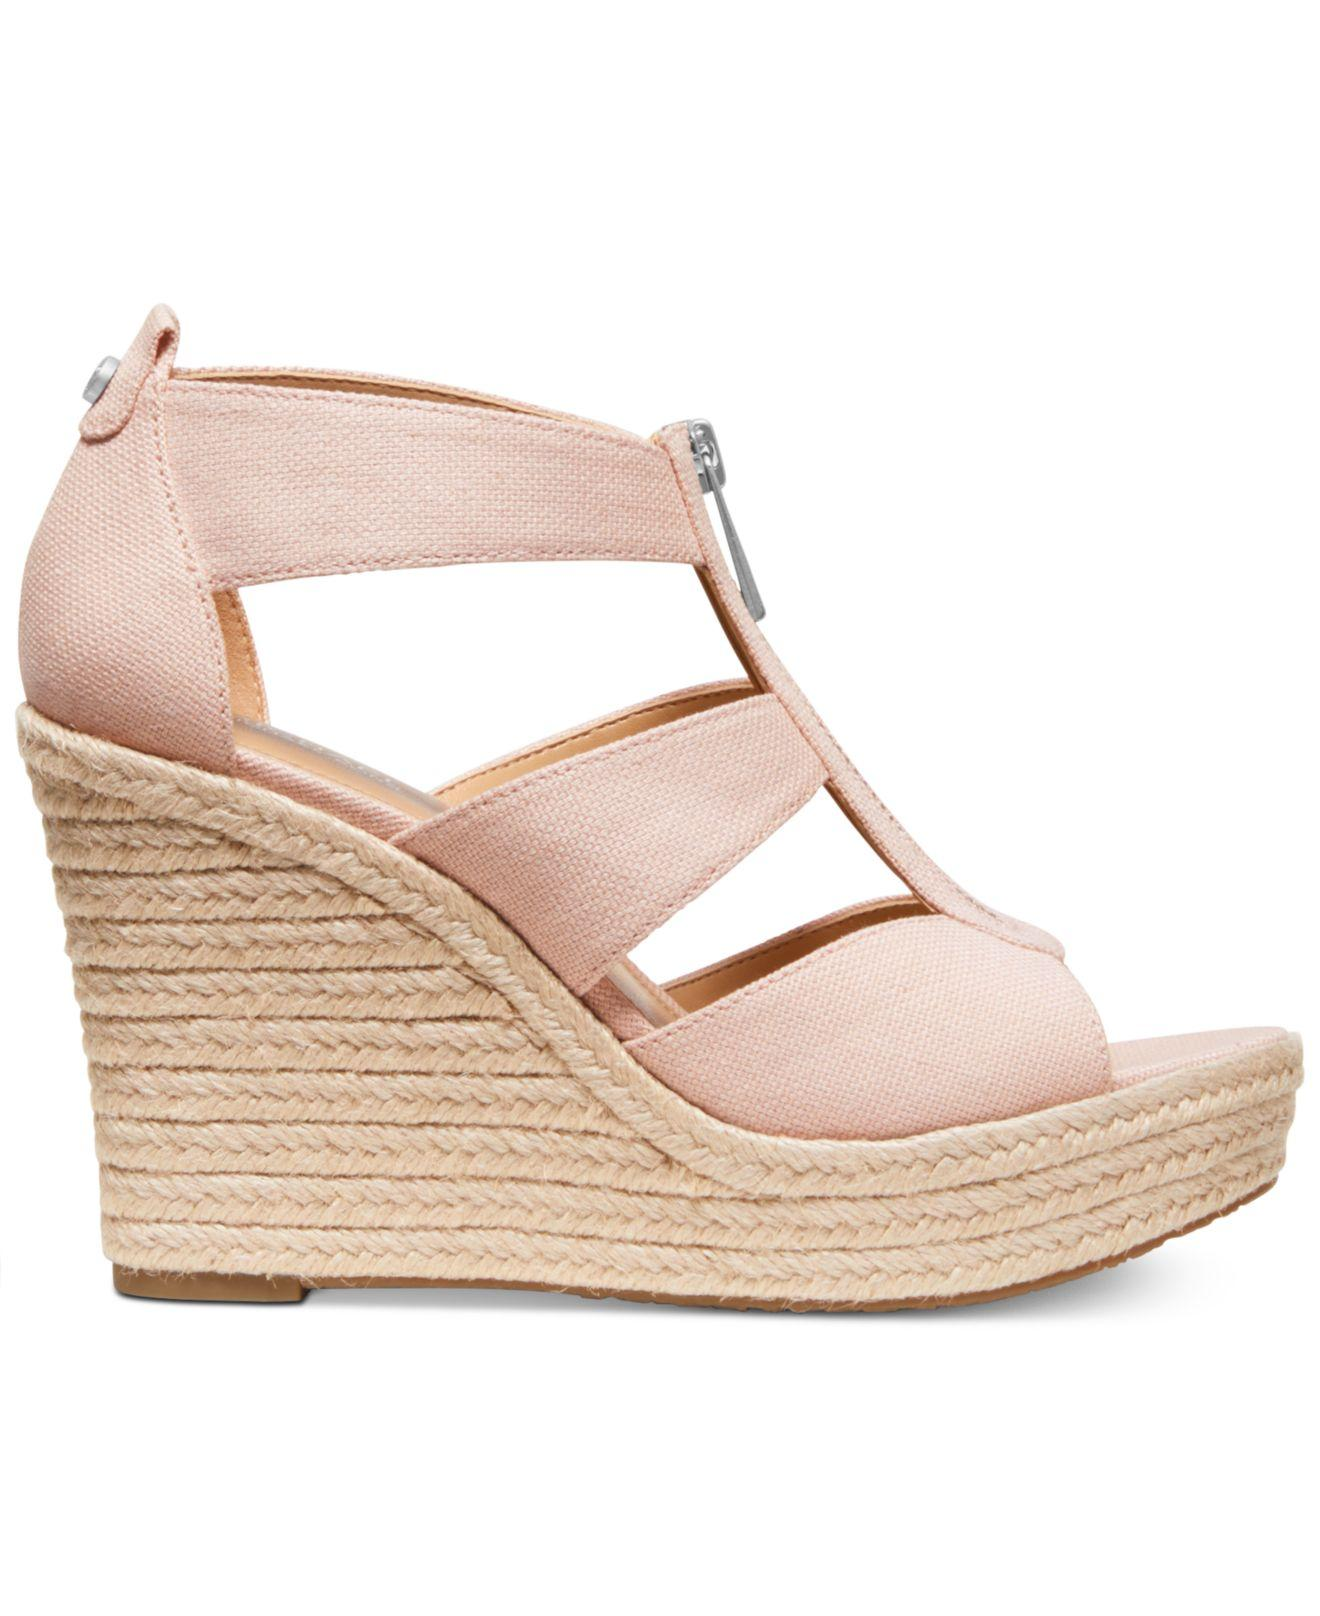 3919c455e279 Michael Kors Michael Damita Platform Wedge Sandals in Pink - Save 56% - Lyst